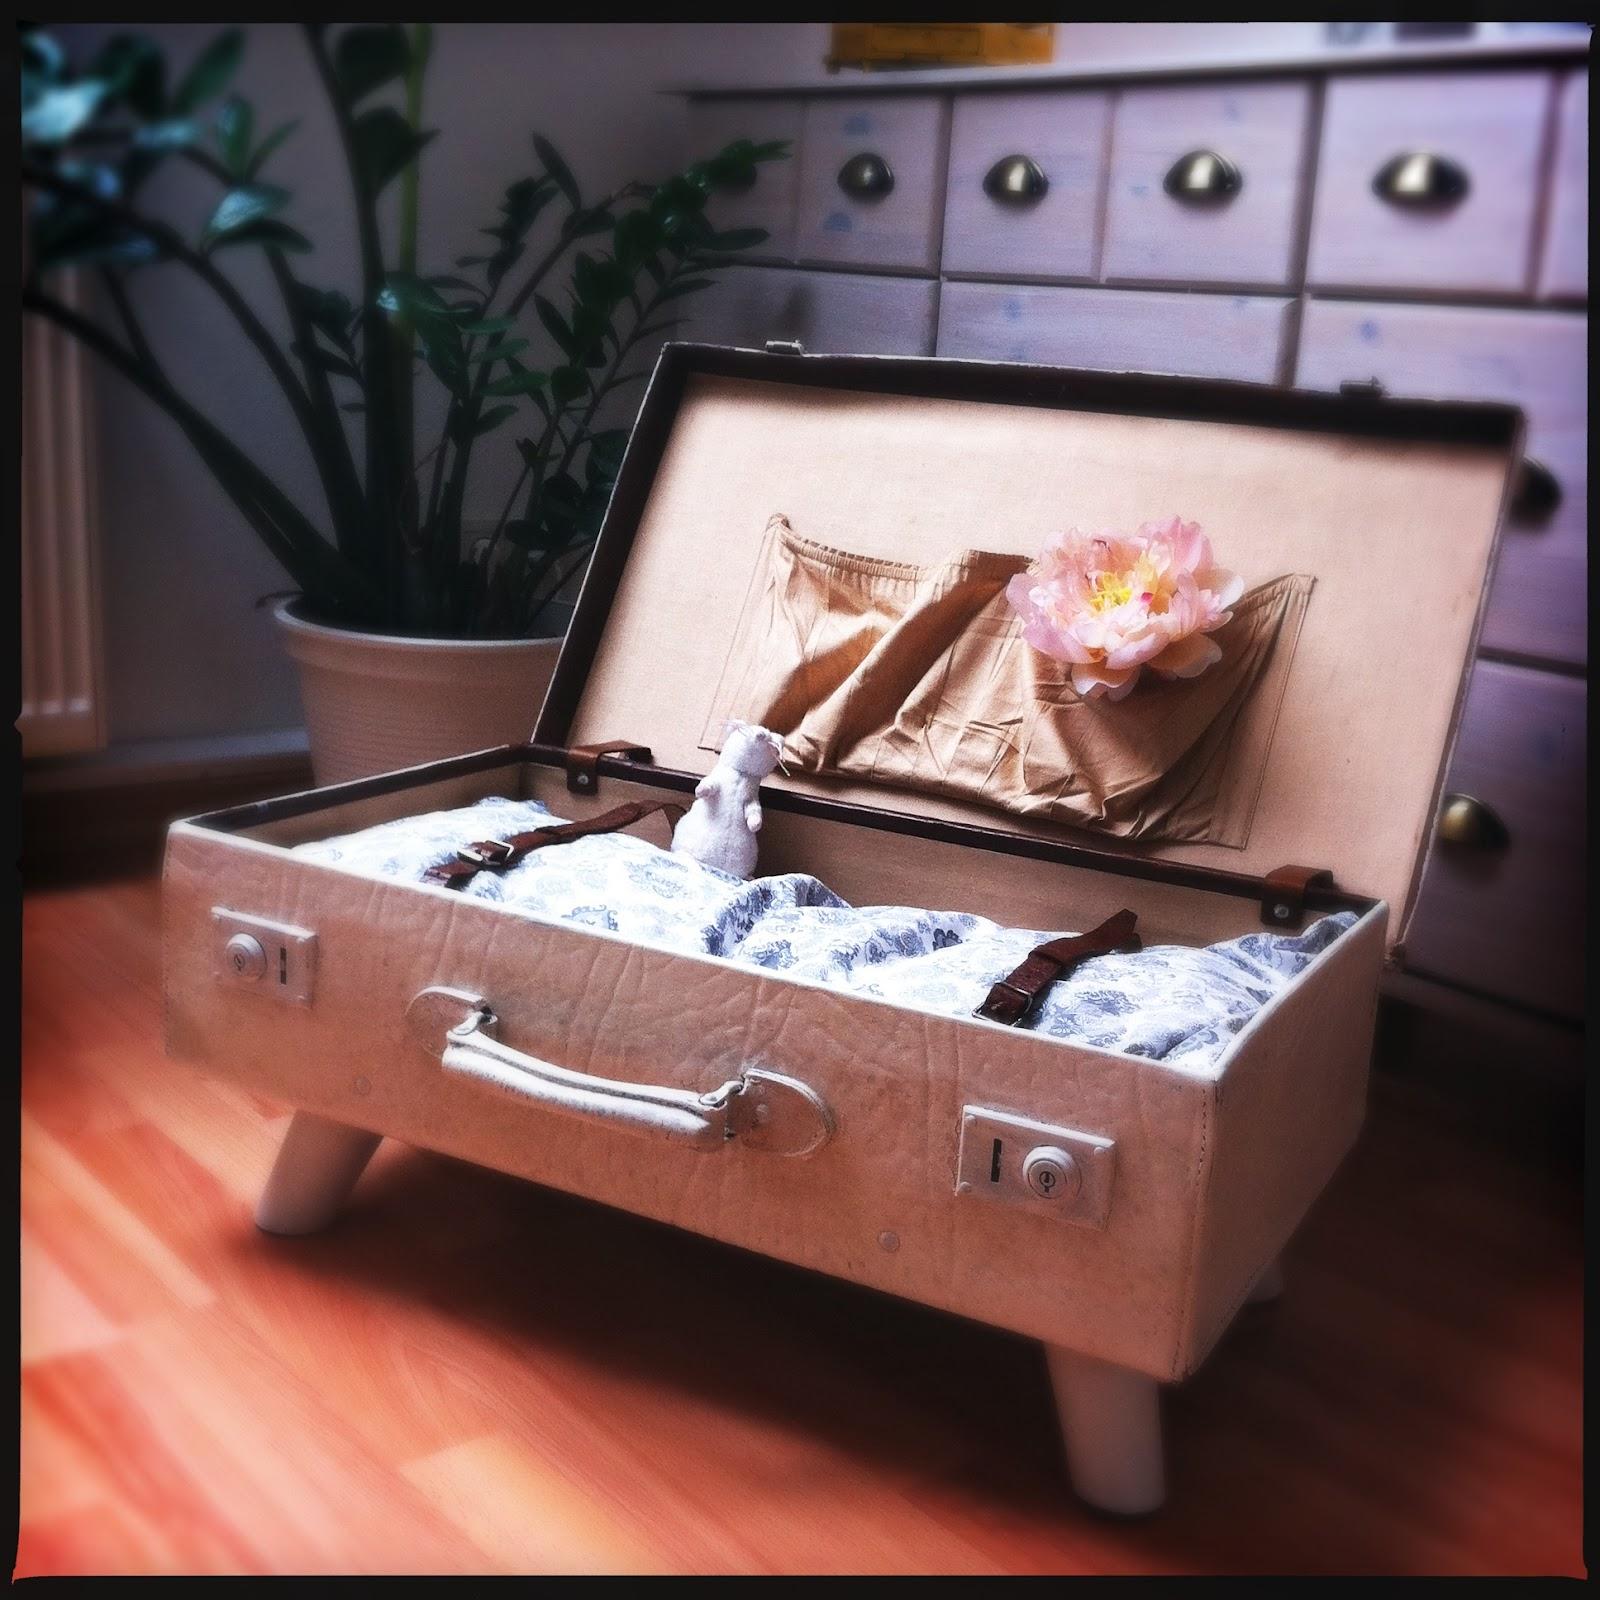 serendipity is life neue alte koffer jetzt bei ebay. Black Bedroom Furniture Sets. Home Design Ideas